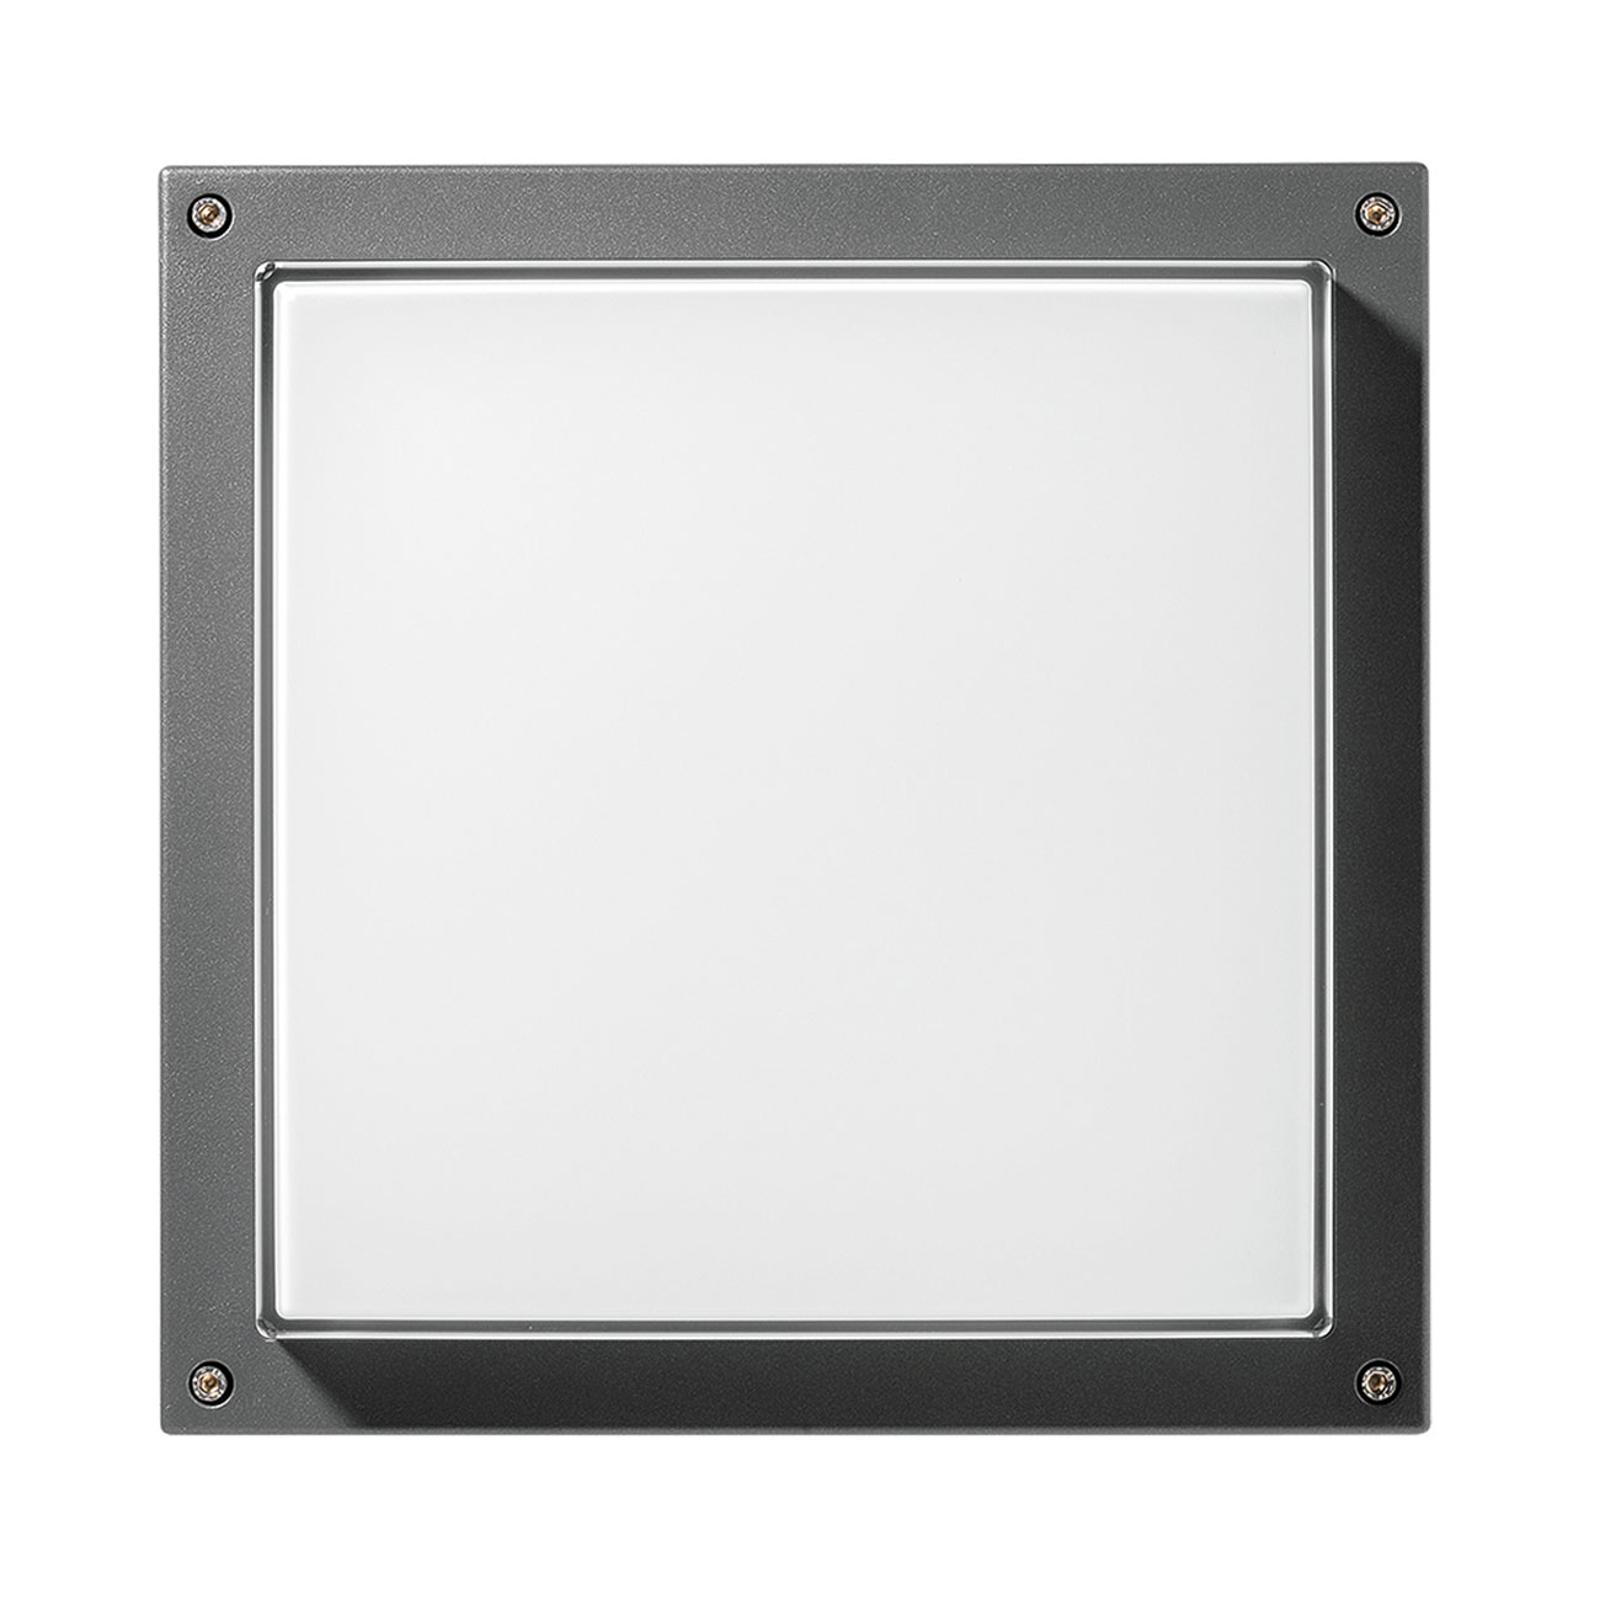 Wandlampe Bliz Square 40 3.000K anthrazit dimmbar